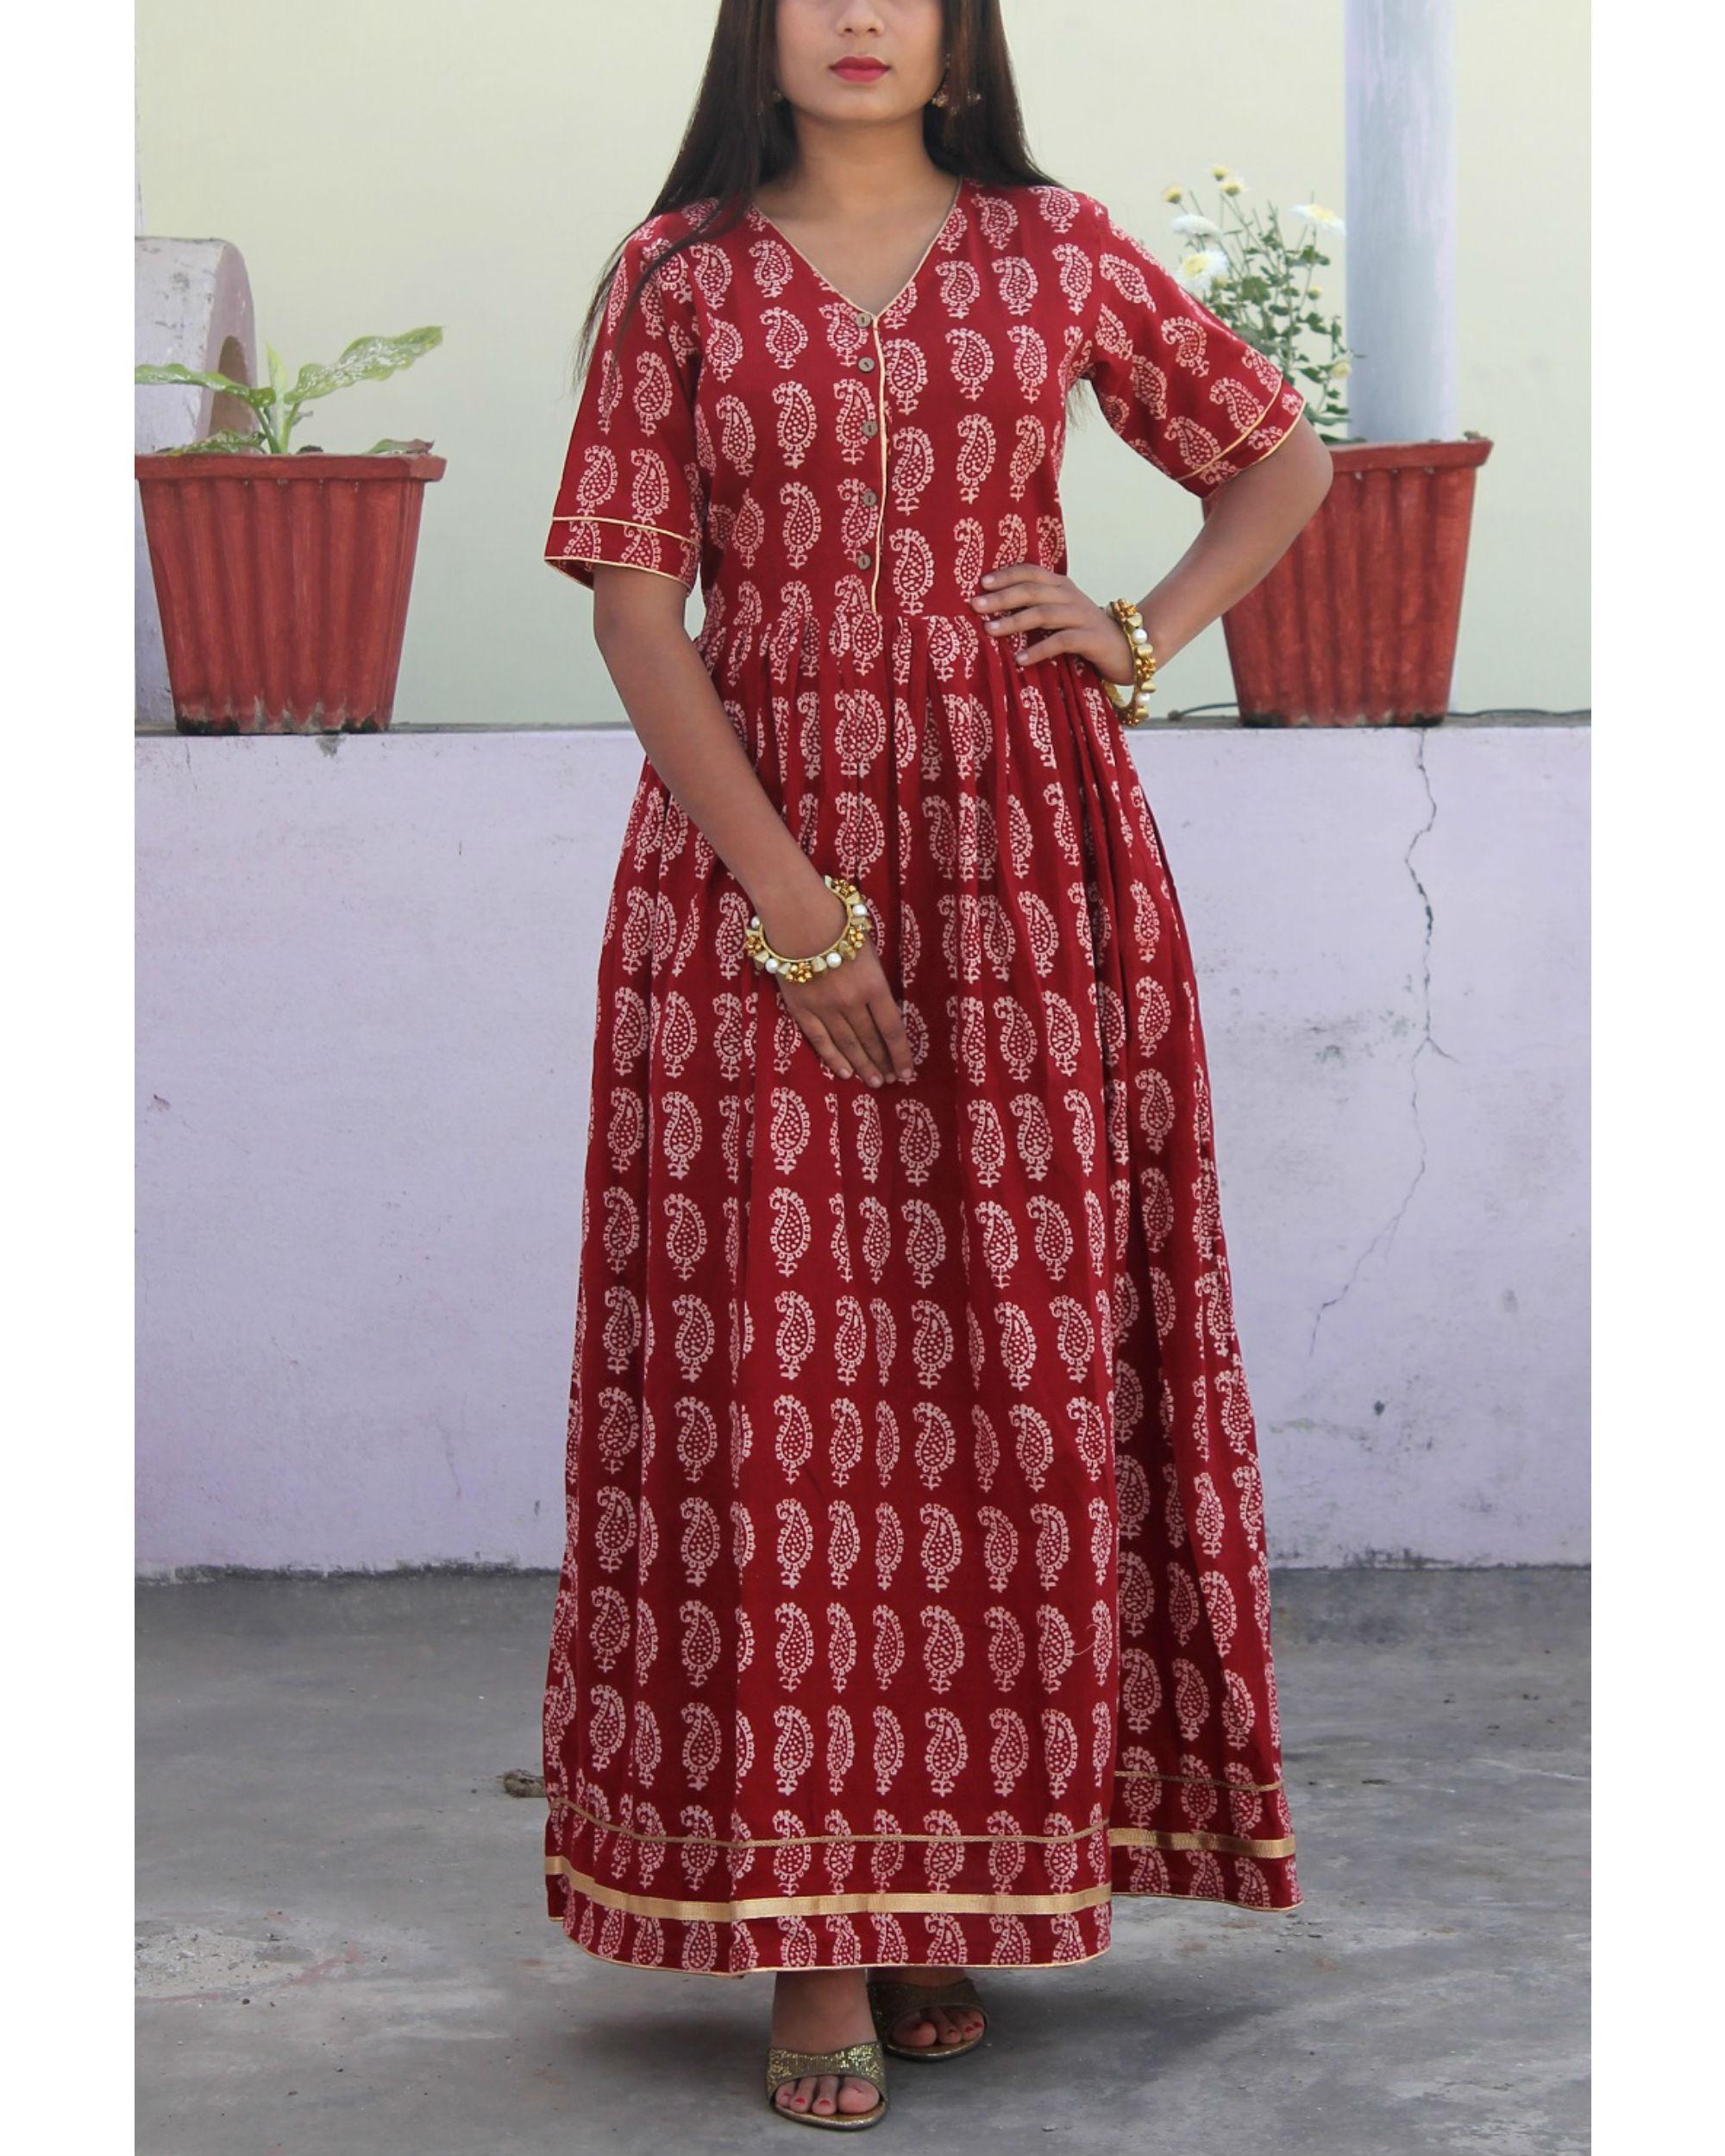 Mehrooni gathered bagh print dress